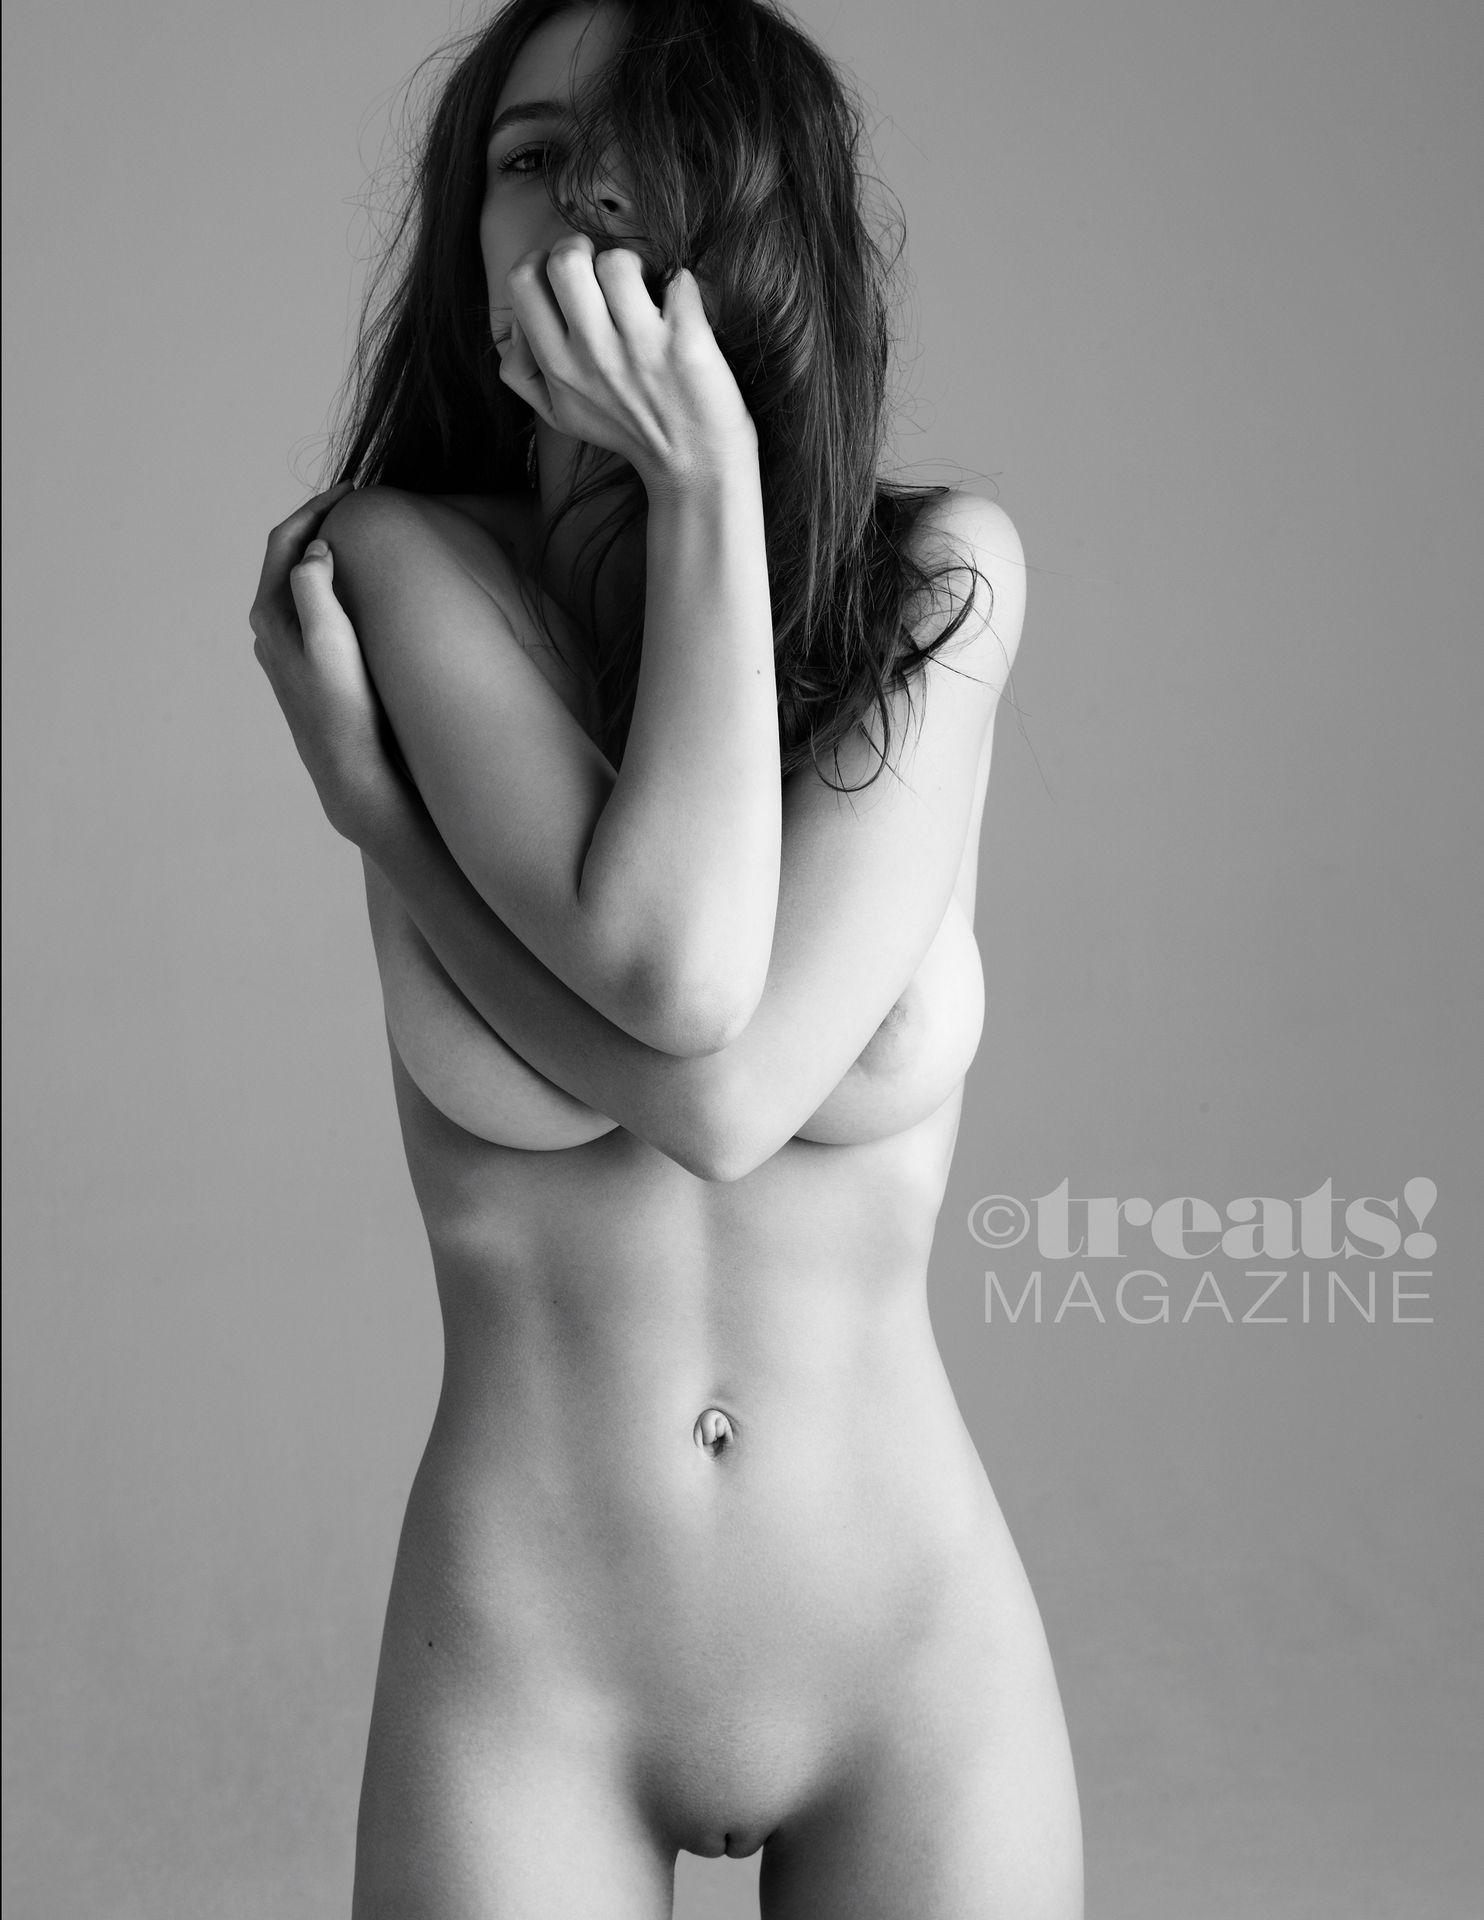 Emily-Ratajkowski-Nude-The-Fappening-Blog-2